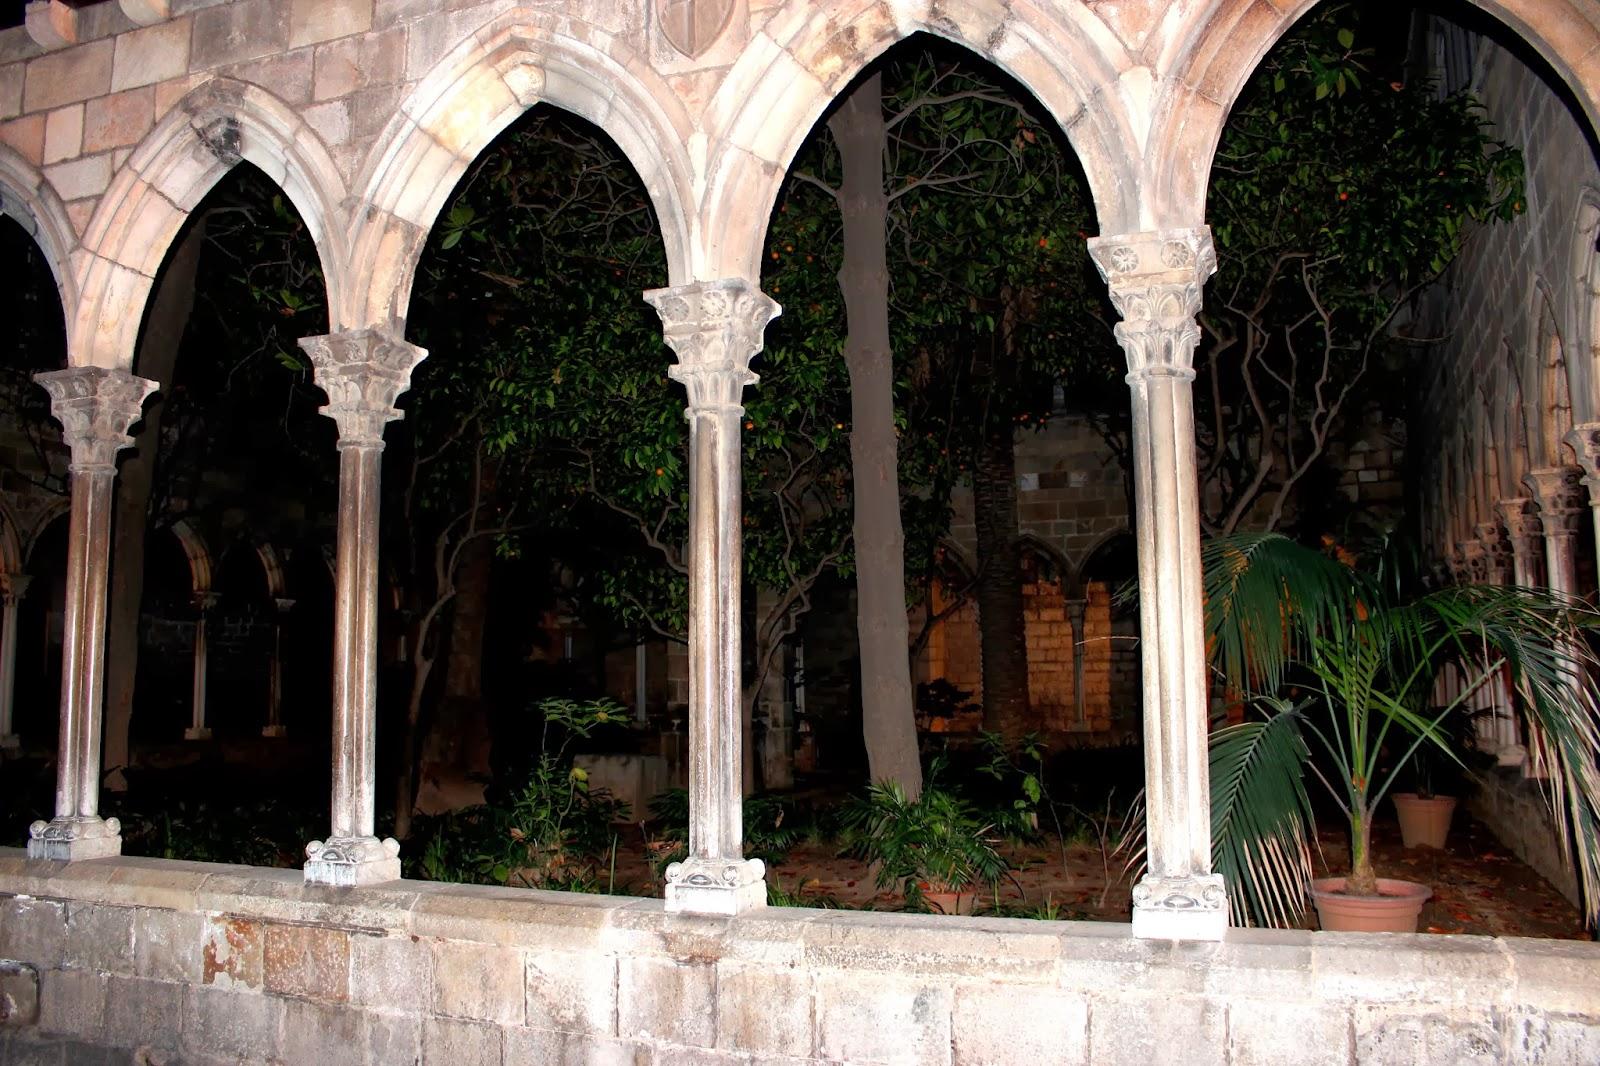 Iglesia de Santa Ana. Barrio Gótico